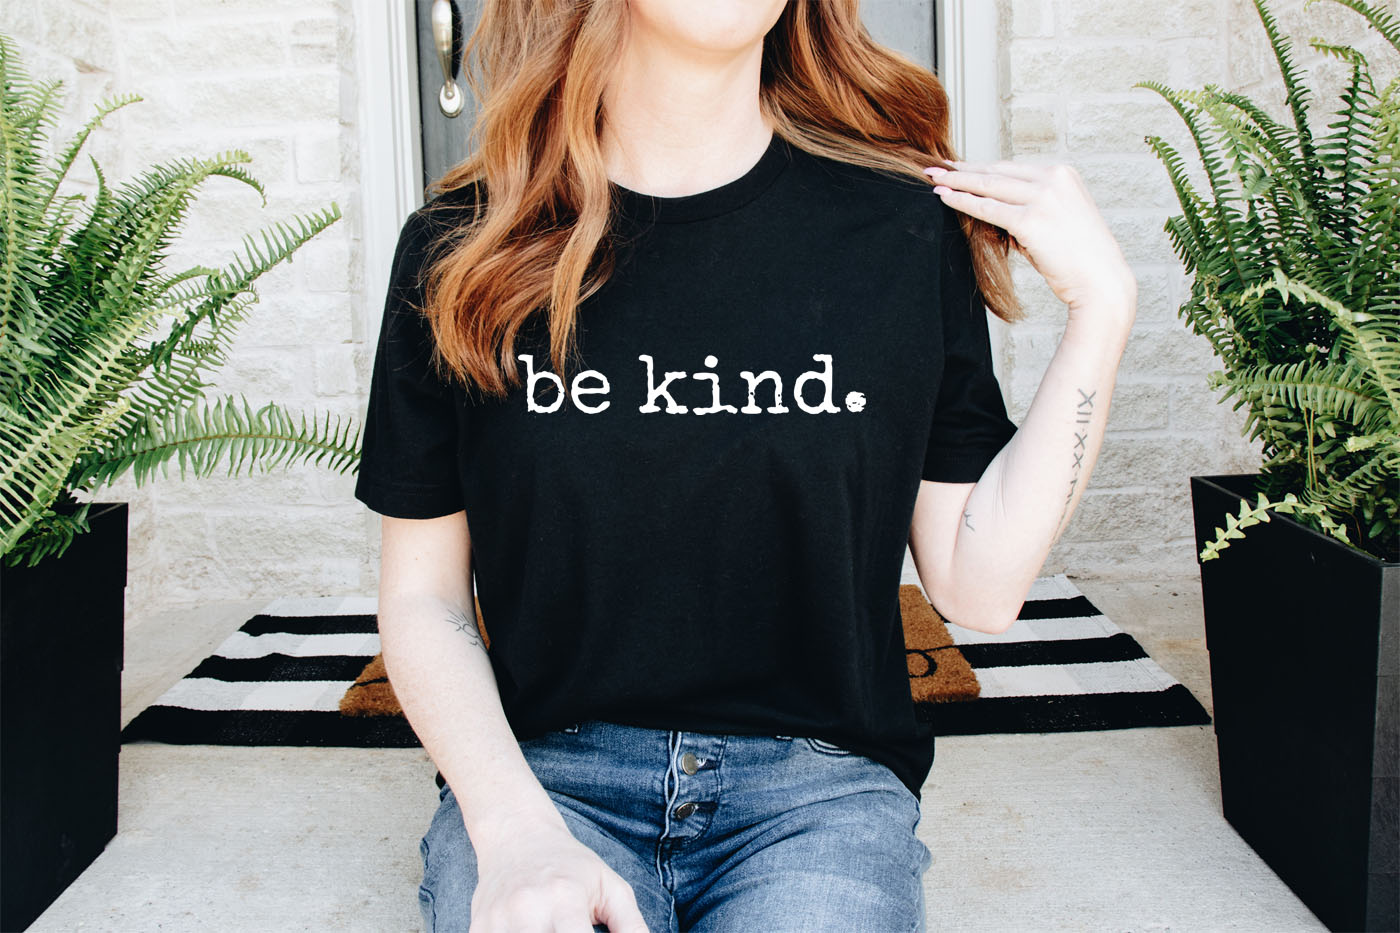 Be Kind Uplifting Gift Kindness T-Shirt